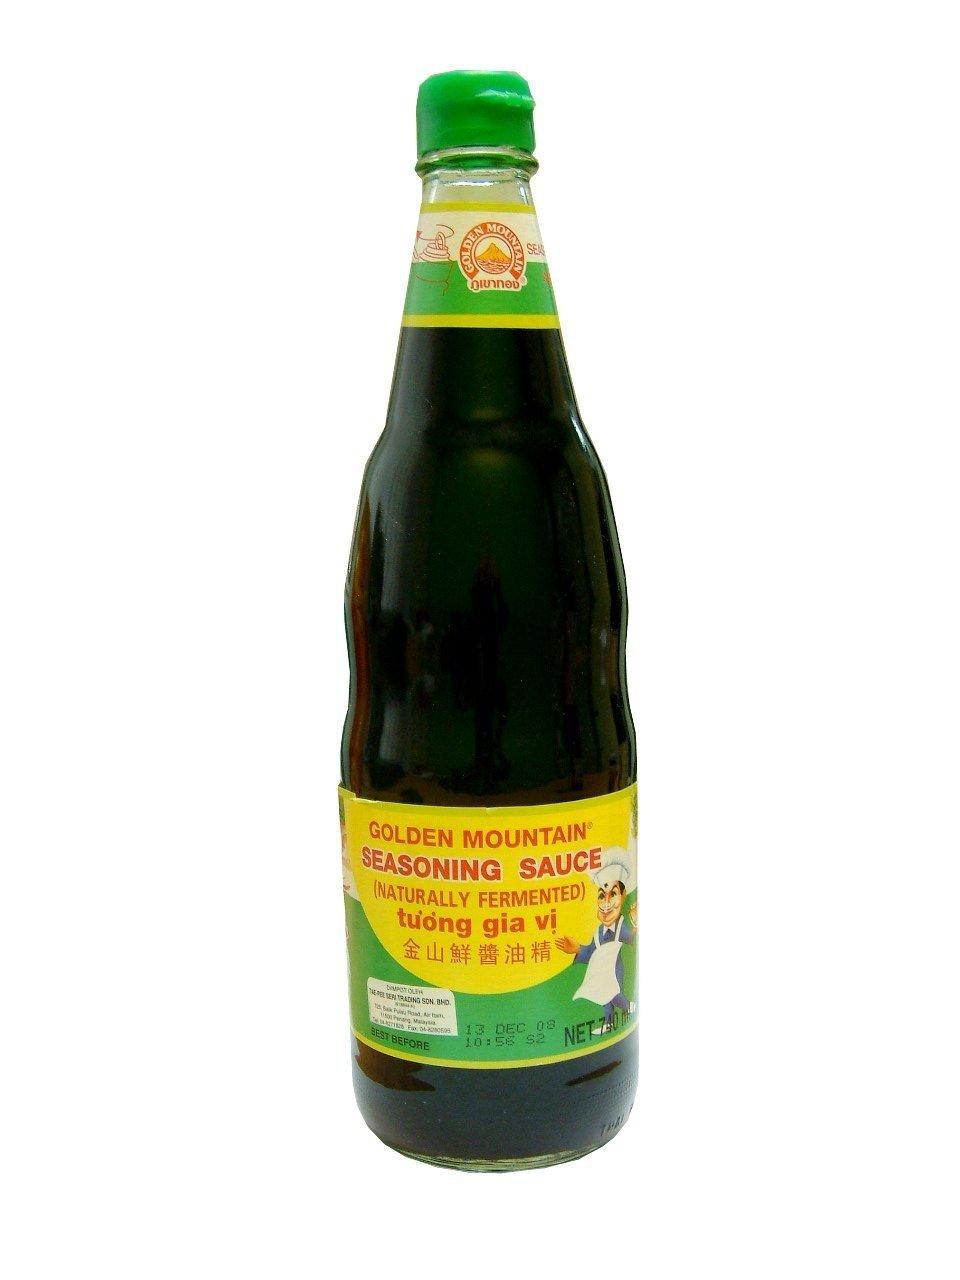 Golden Mountain Seasoning Sauce, 20 Ounce